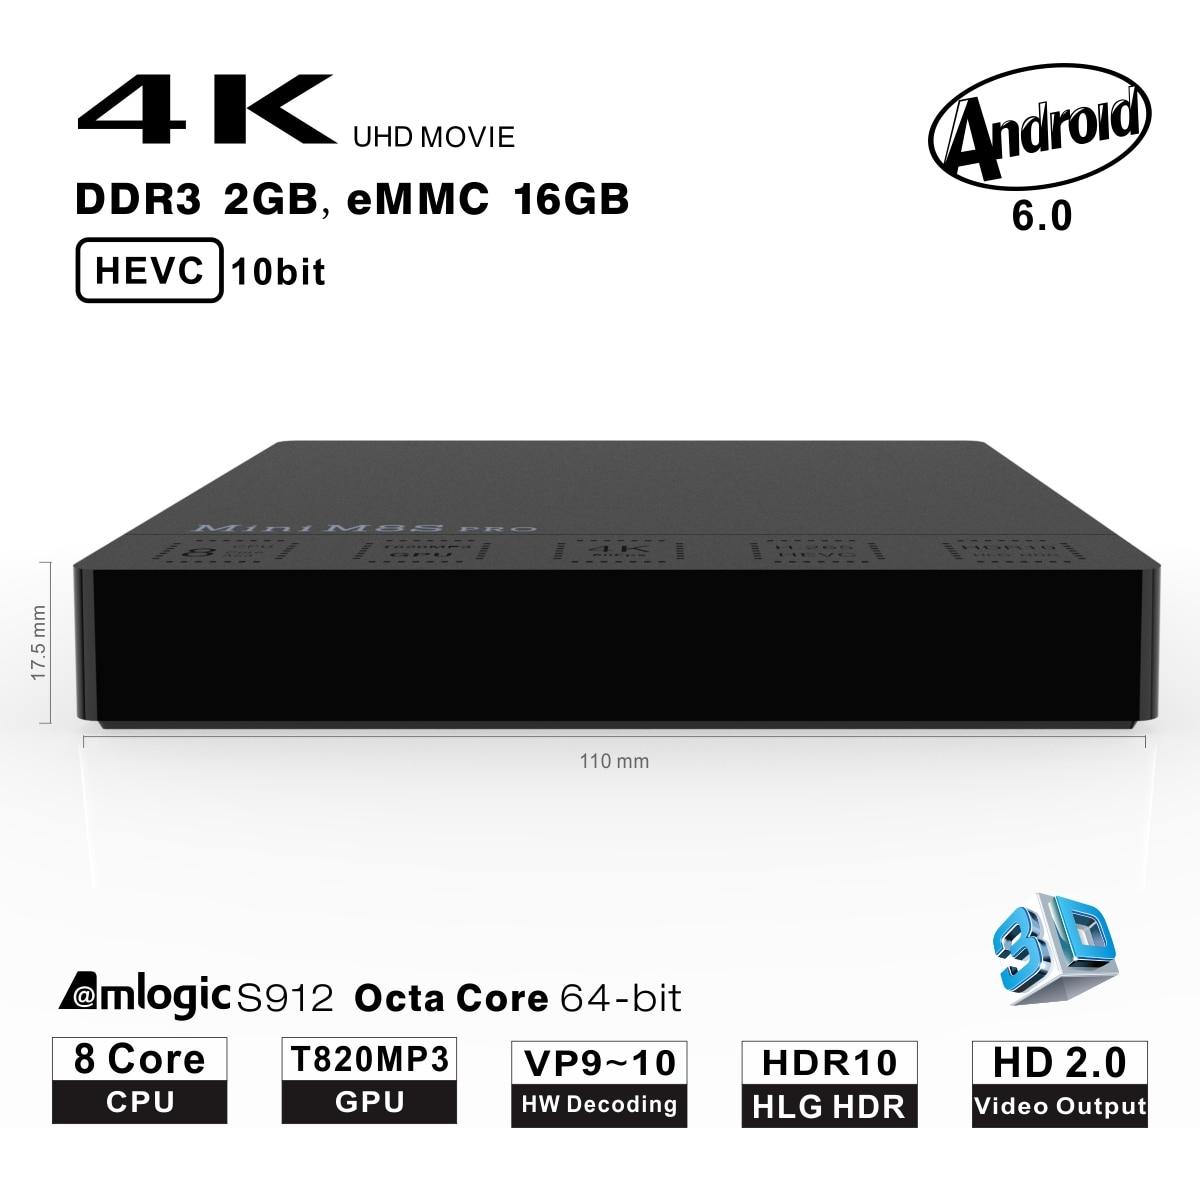 JRGK Mini M8S PRO android tv box Set-top Boxes Amlogic Core 64Bit Android Smart TV Box DDR3 2GB 16GB BT Wifi Media Player new t95n mini m8s pro android 6 0 tv box s905x quad core bluetooth wifi 16 0 2g 8g memory smart set top box emmc ddr3